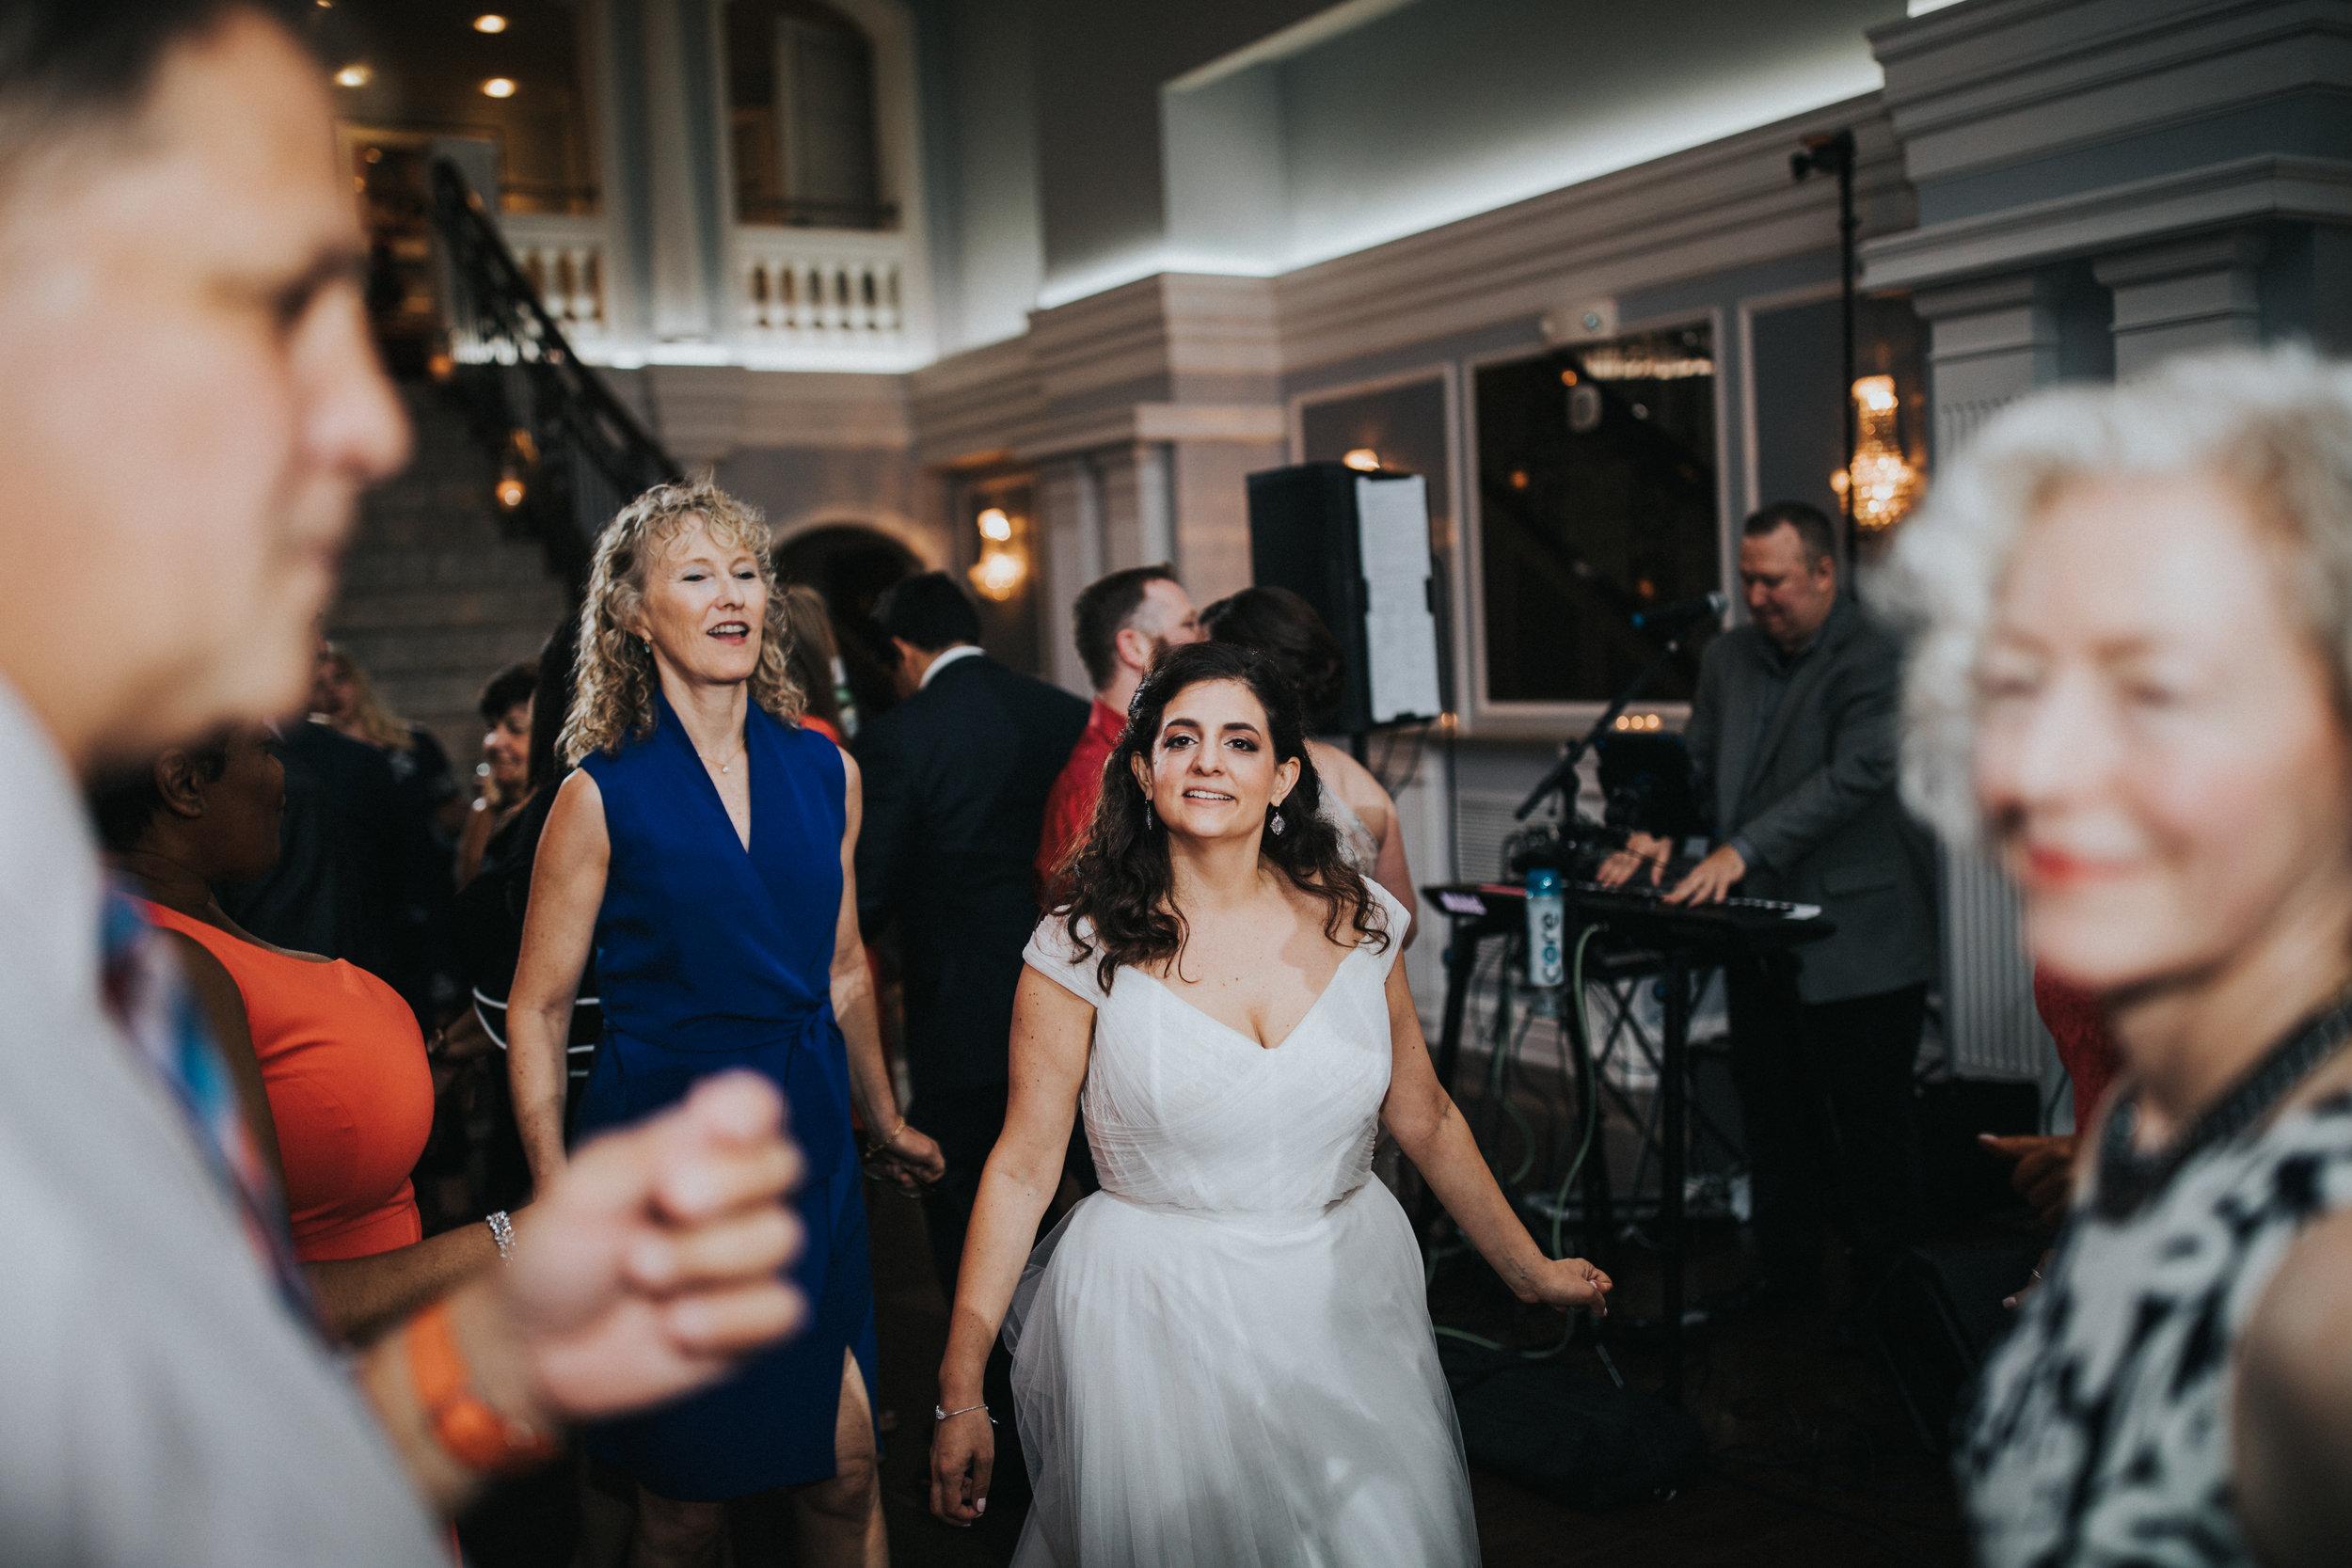 JennaLynnPhotography-NJWeddingPhotographer-Philadelphia-Wedding-ArtsBallroom-Reception-138.jpg